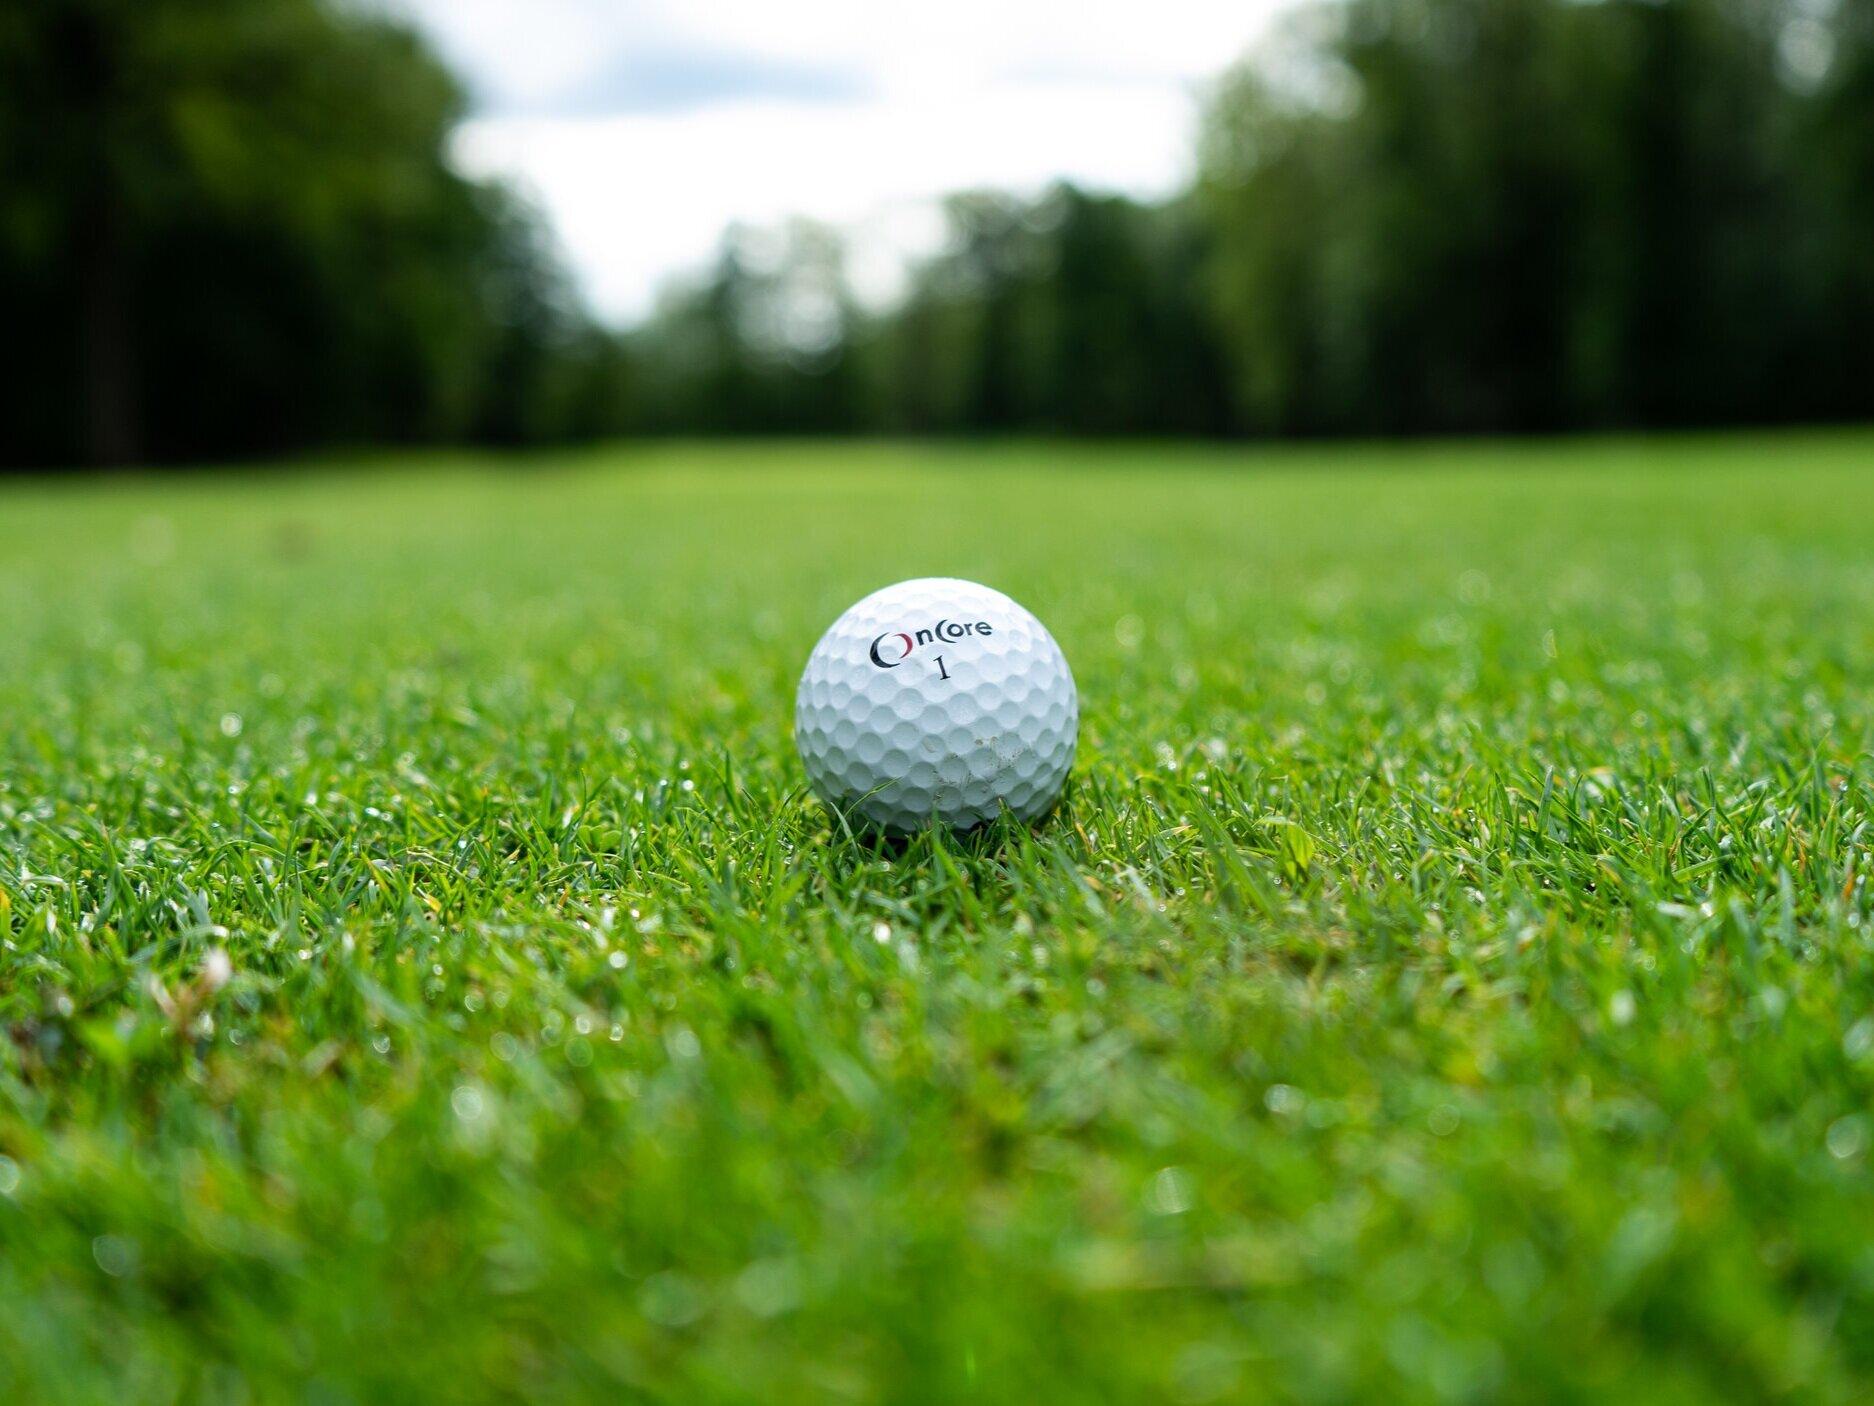 Sept 25PITTSBURGH - Olde Stonewall Golf Club